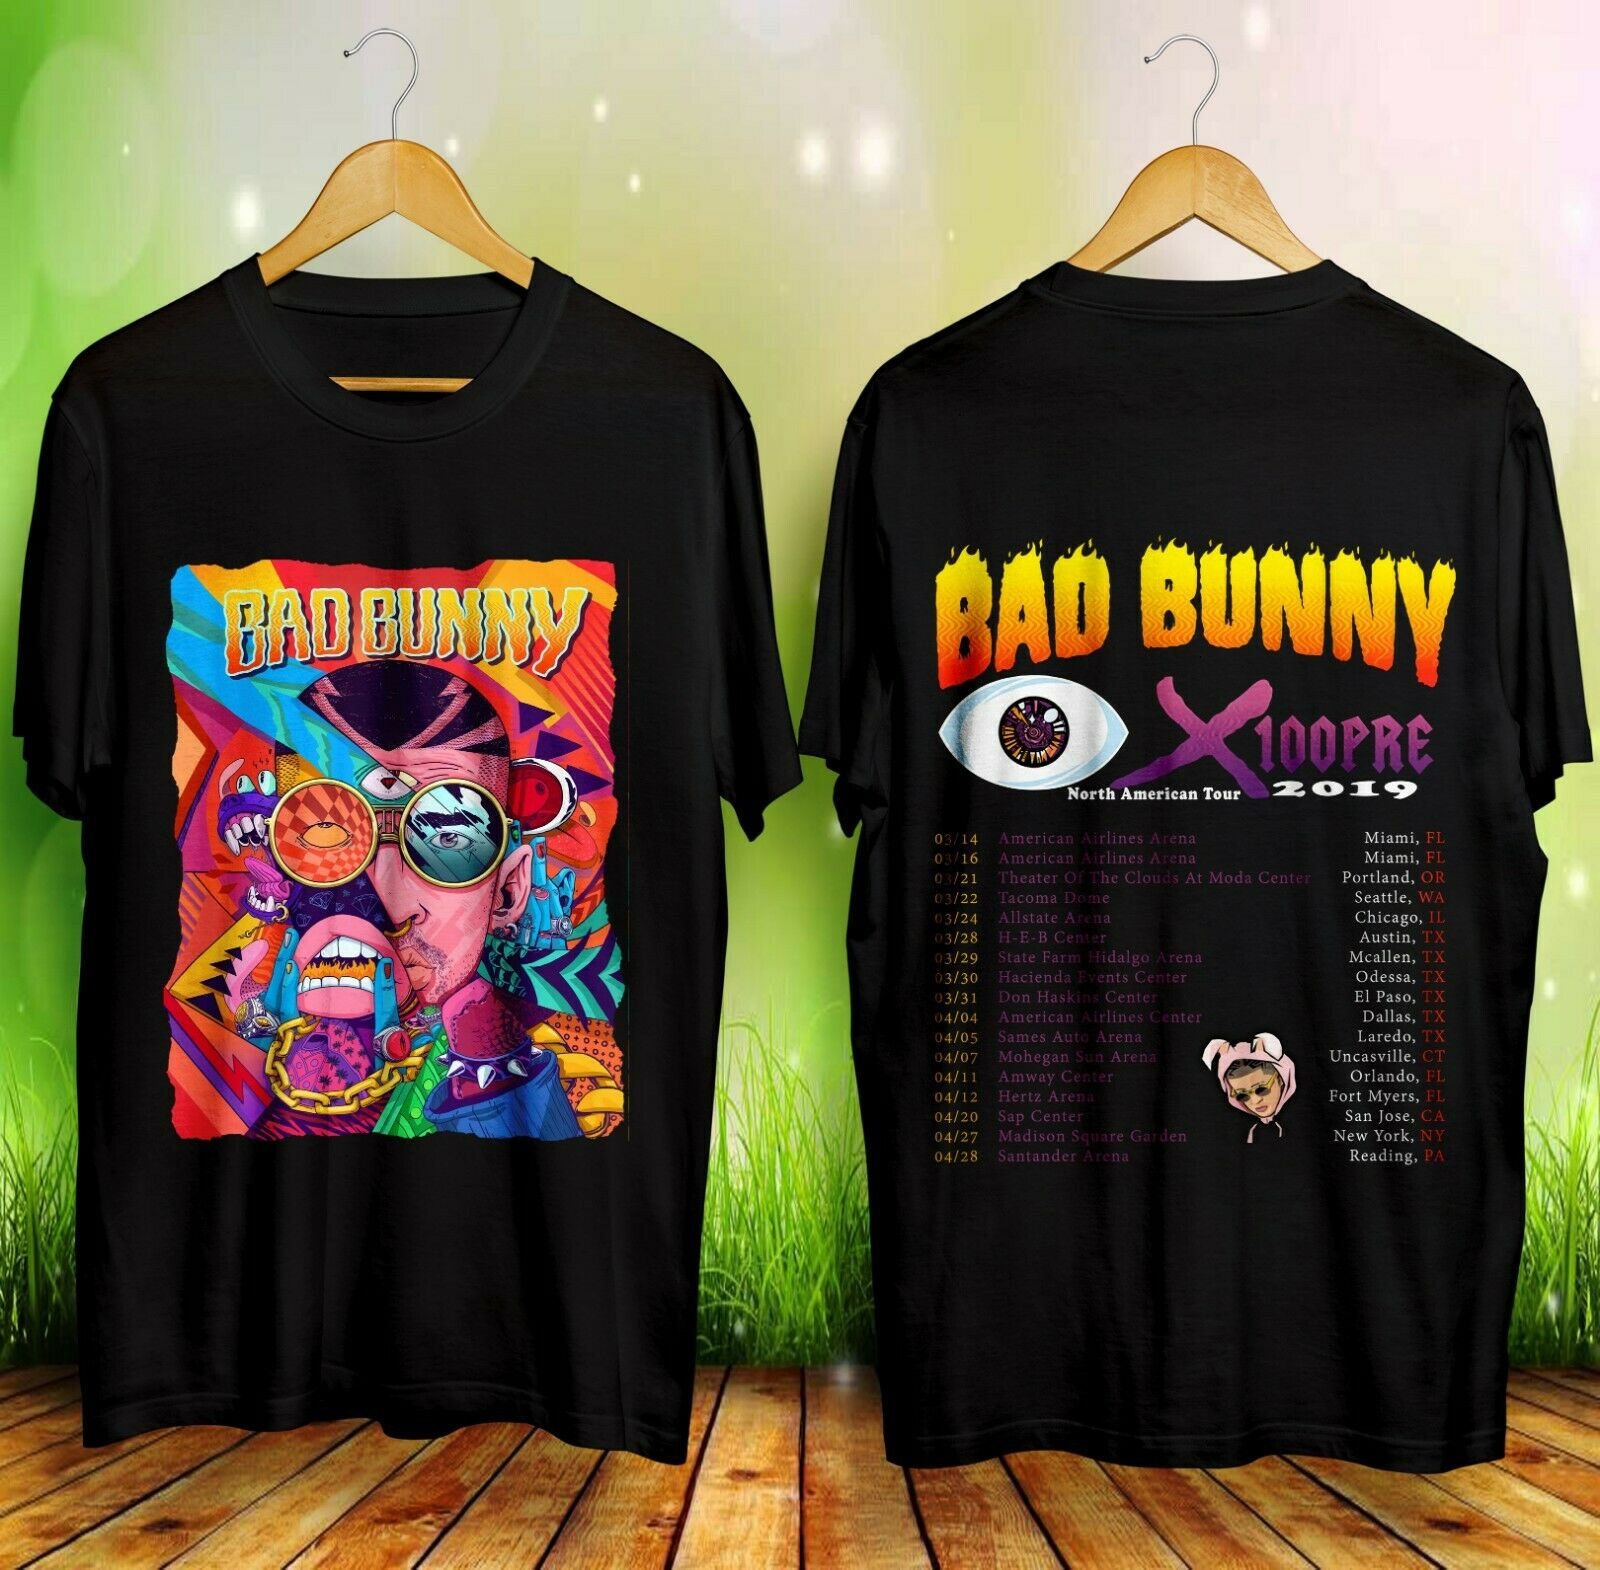 Nueva camiseta negra para hombre BAD BUNNY Tour 2019 con citas talla S-3XL